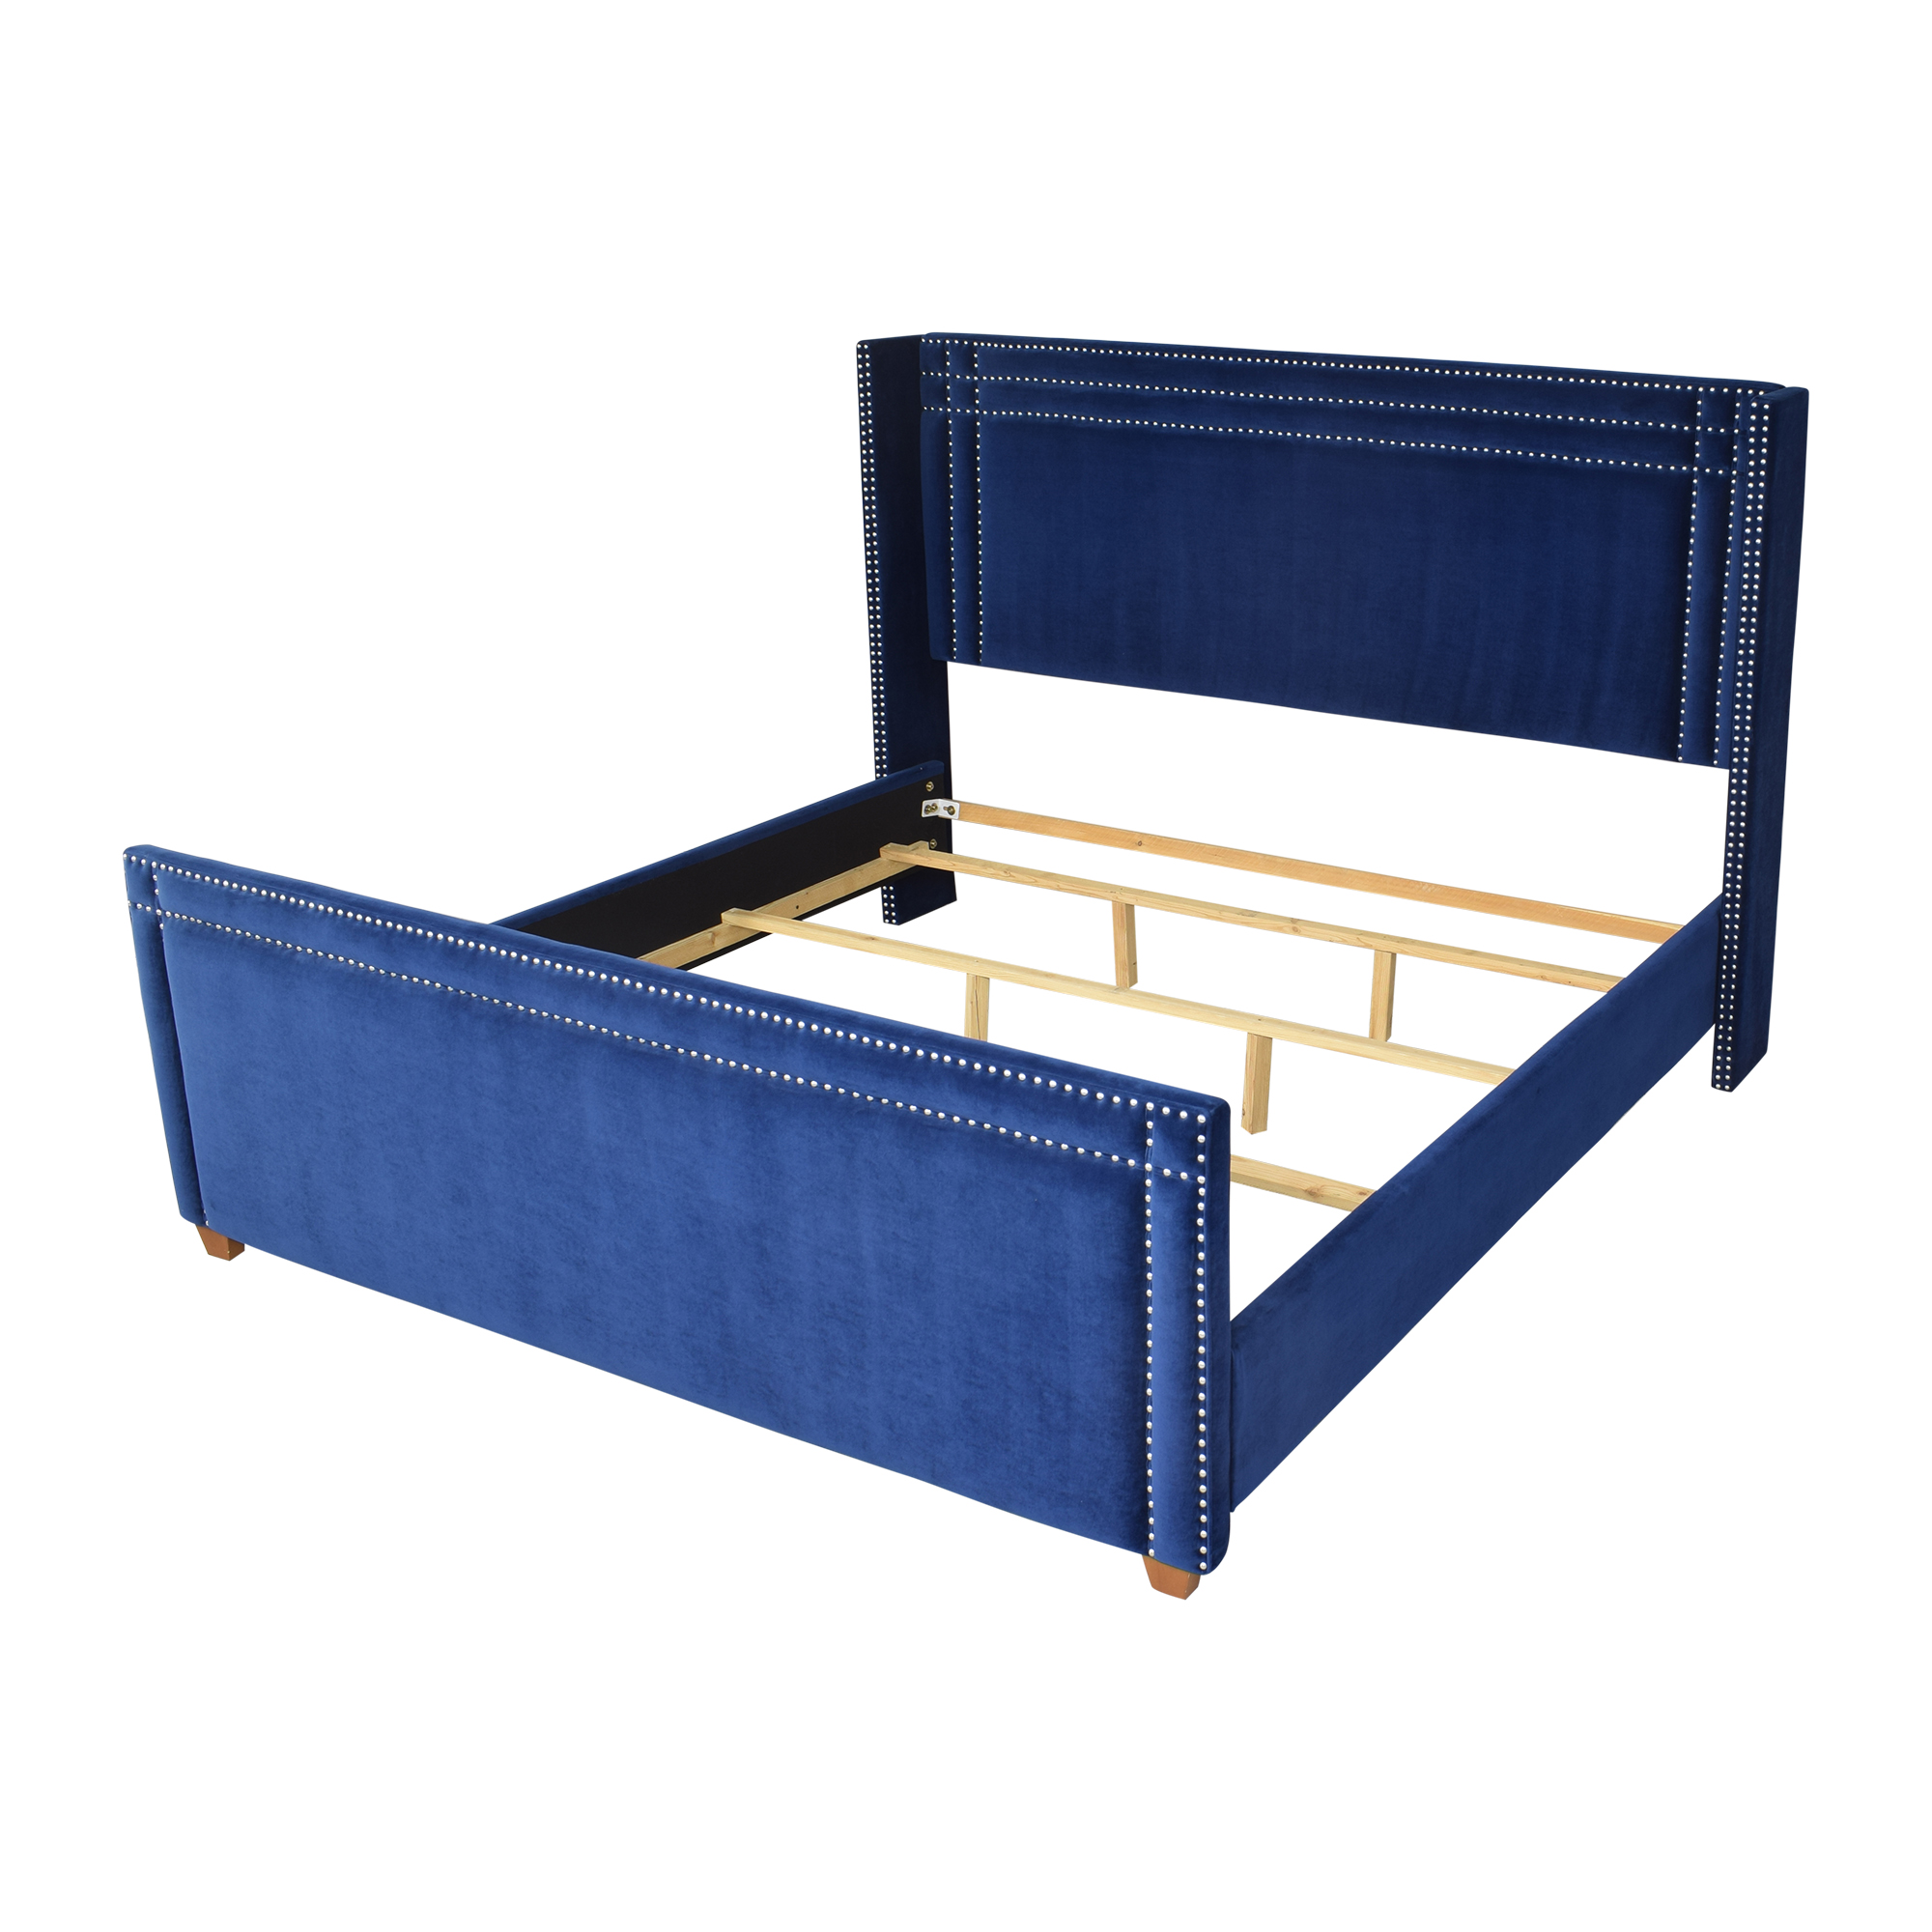 Wayfair Wayfair Willa Arlo Interiors Janna Upholstered Low Profile King Bed dimensions